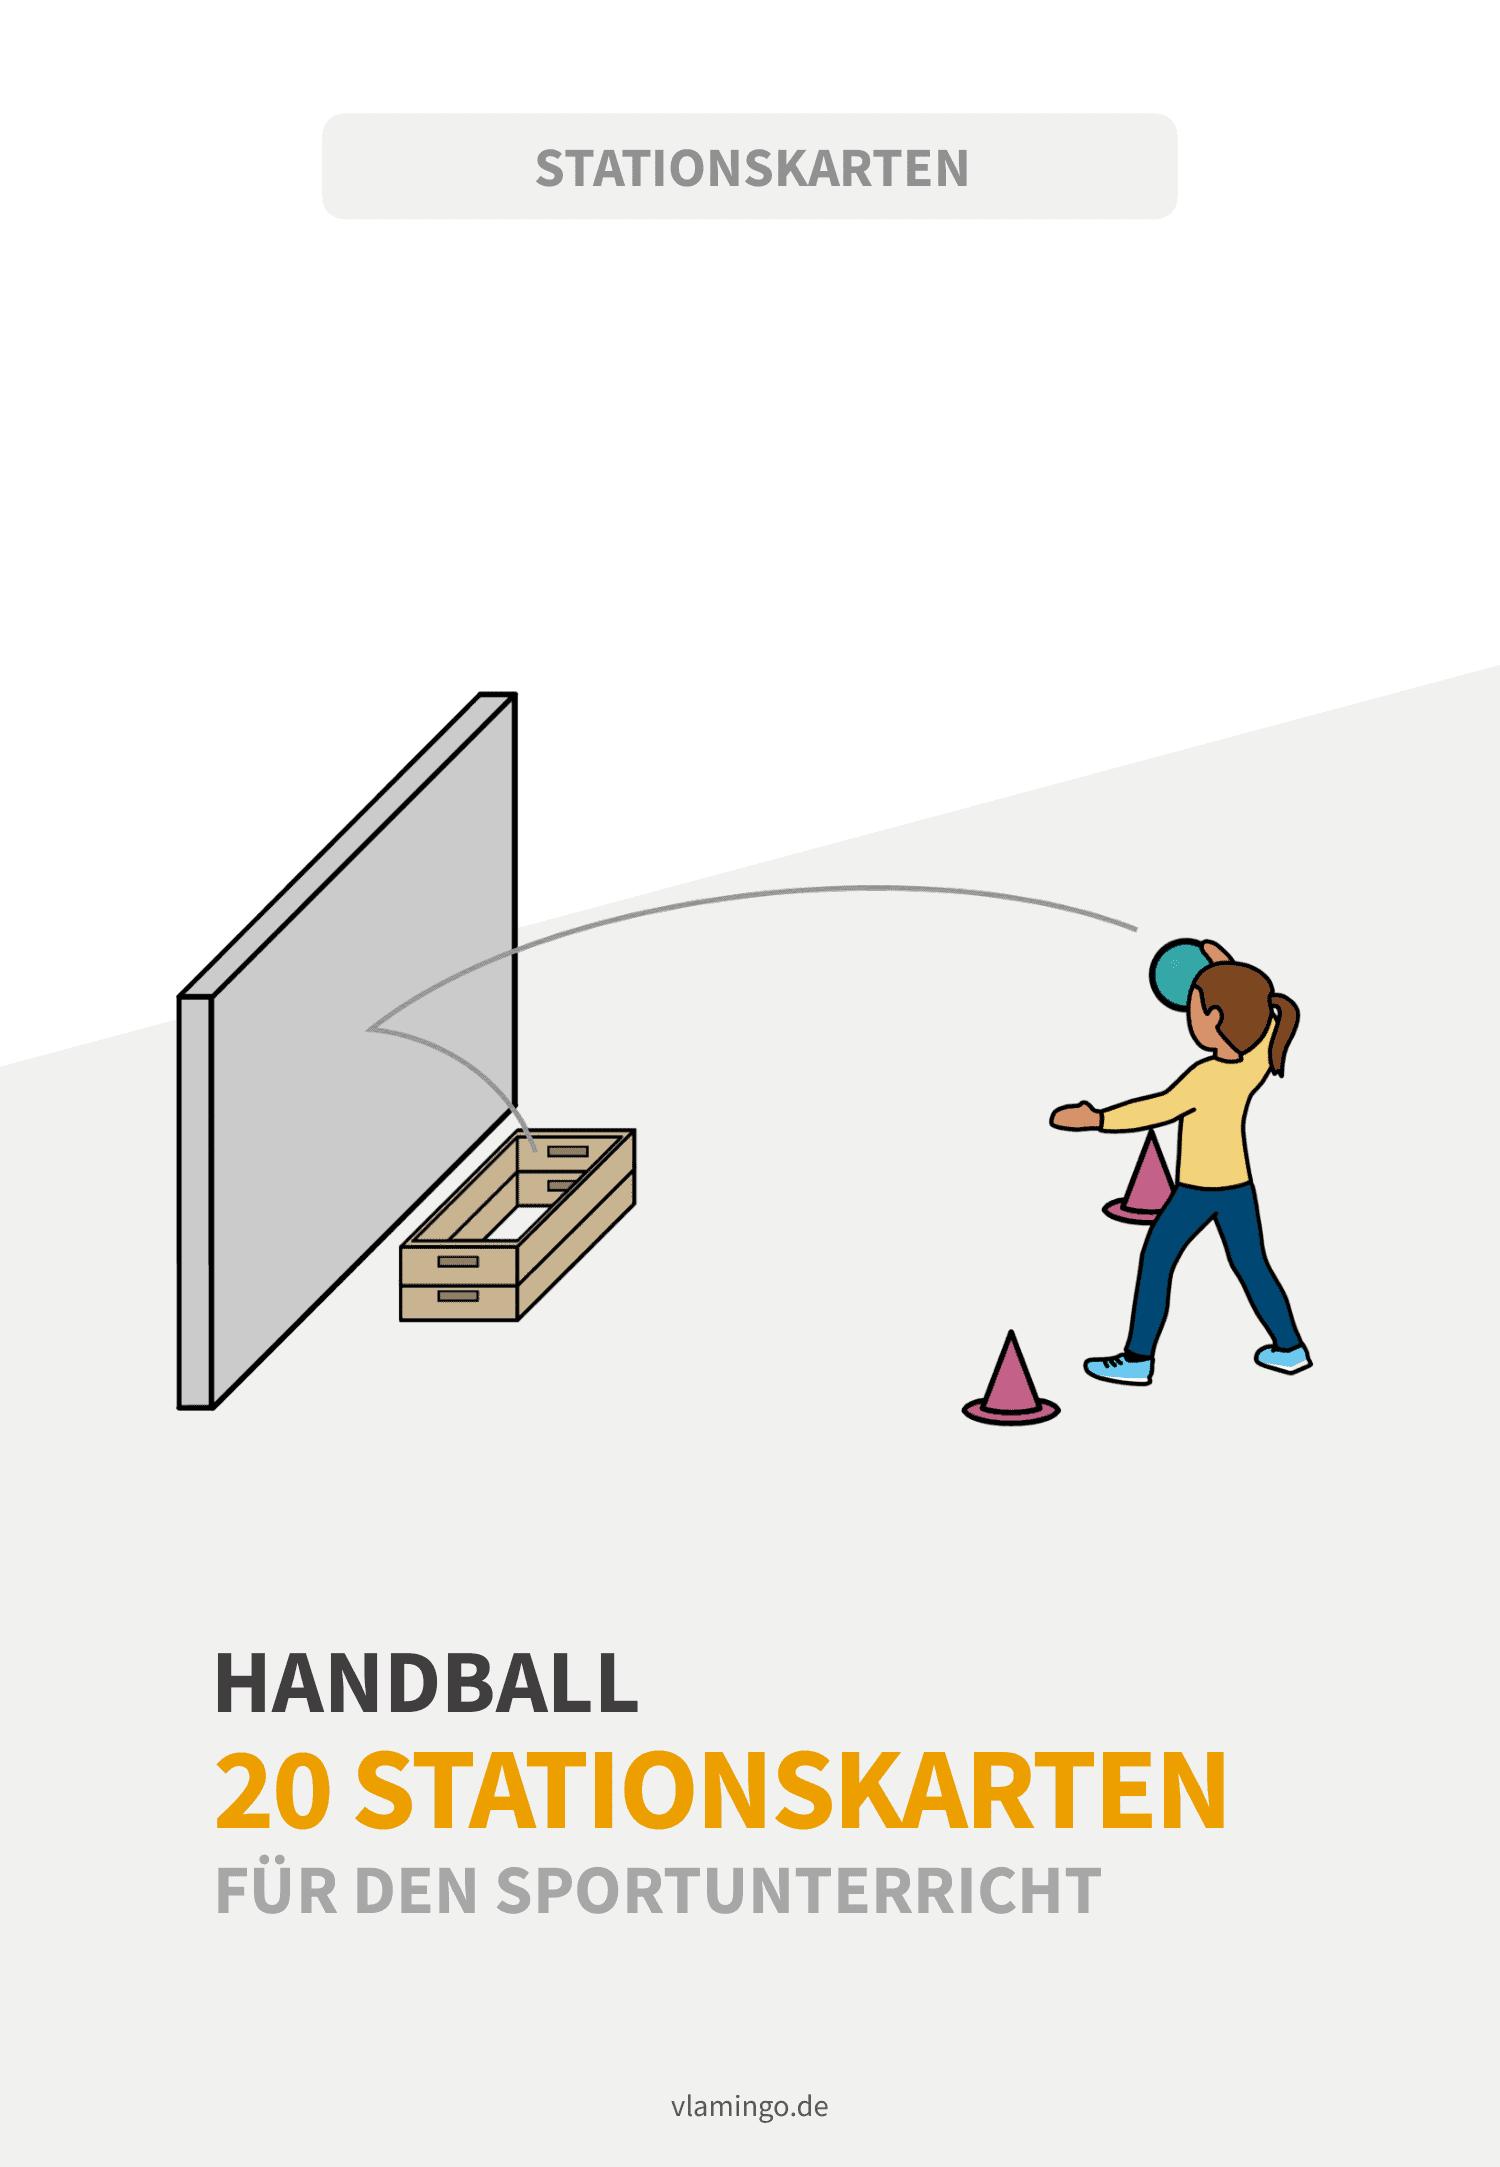 Handball - 20 Stationskarten für den Sportunterricht